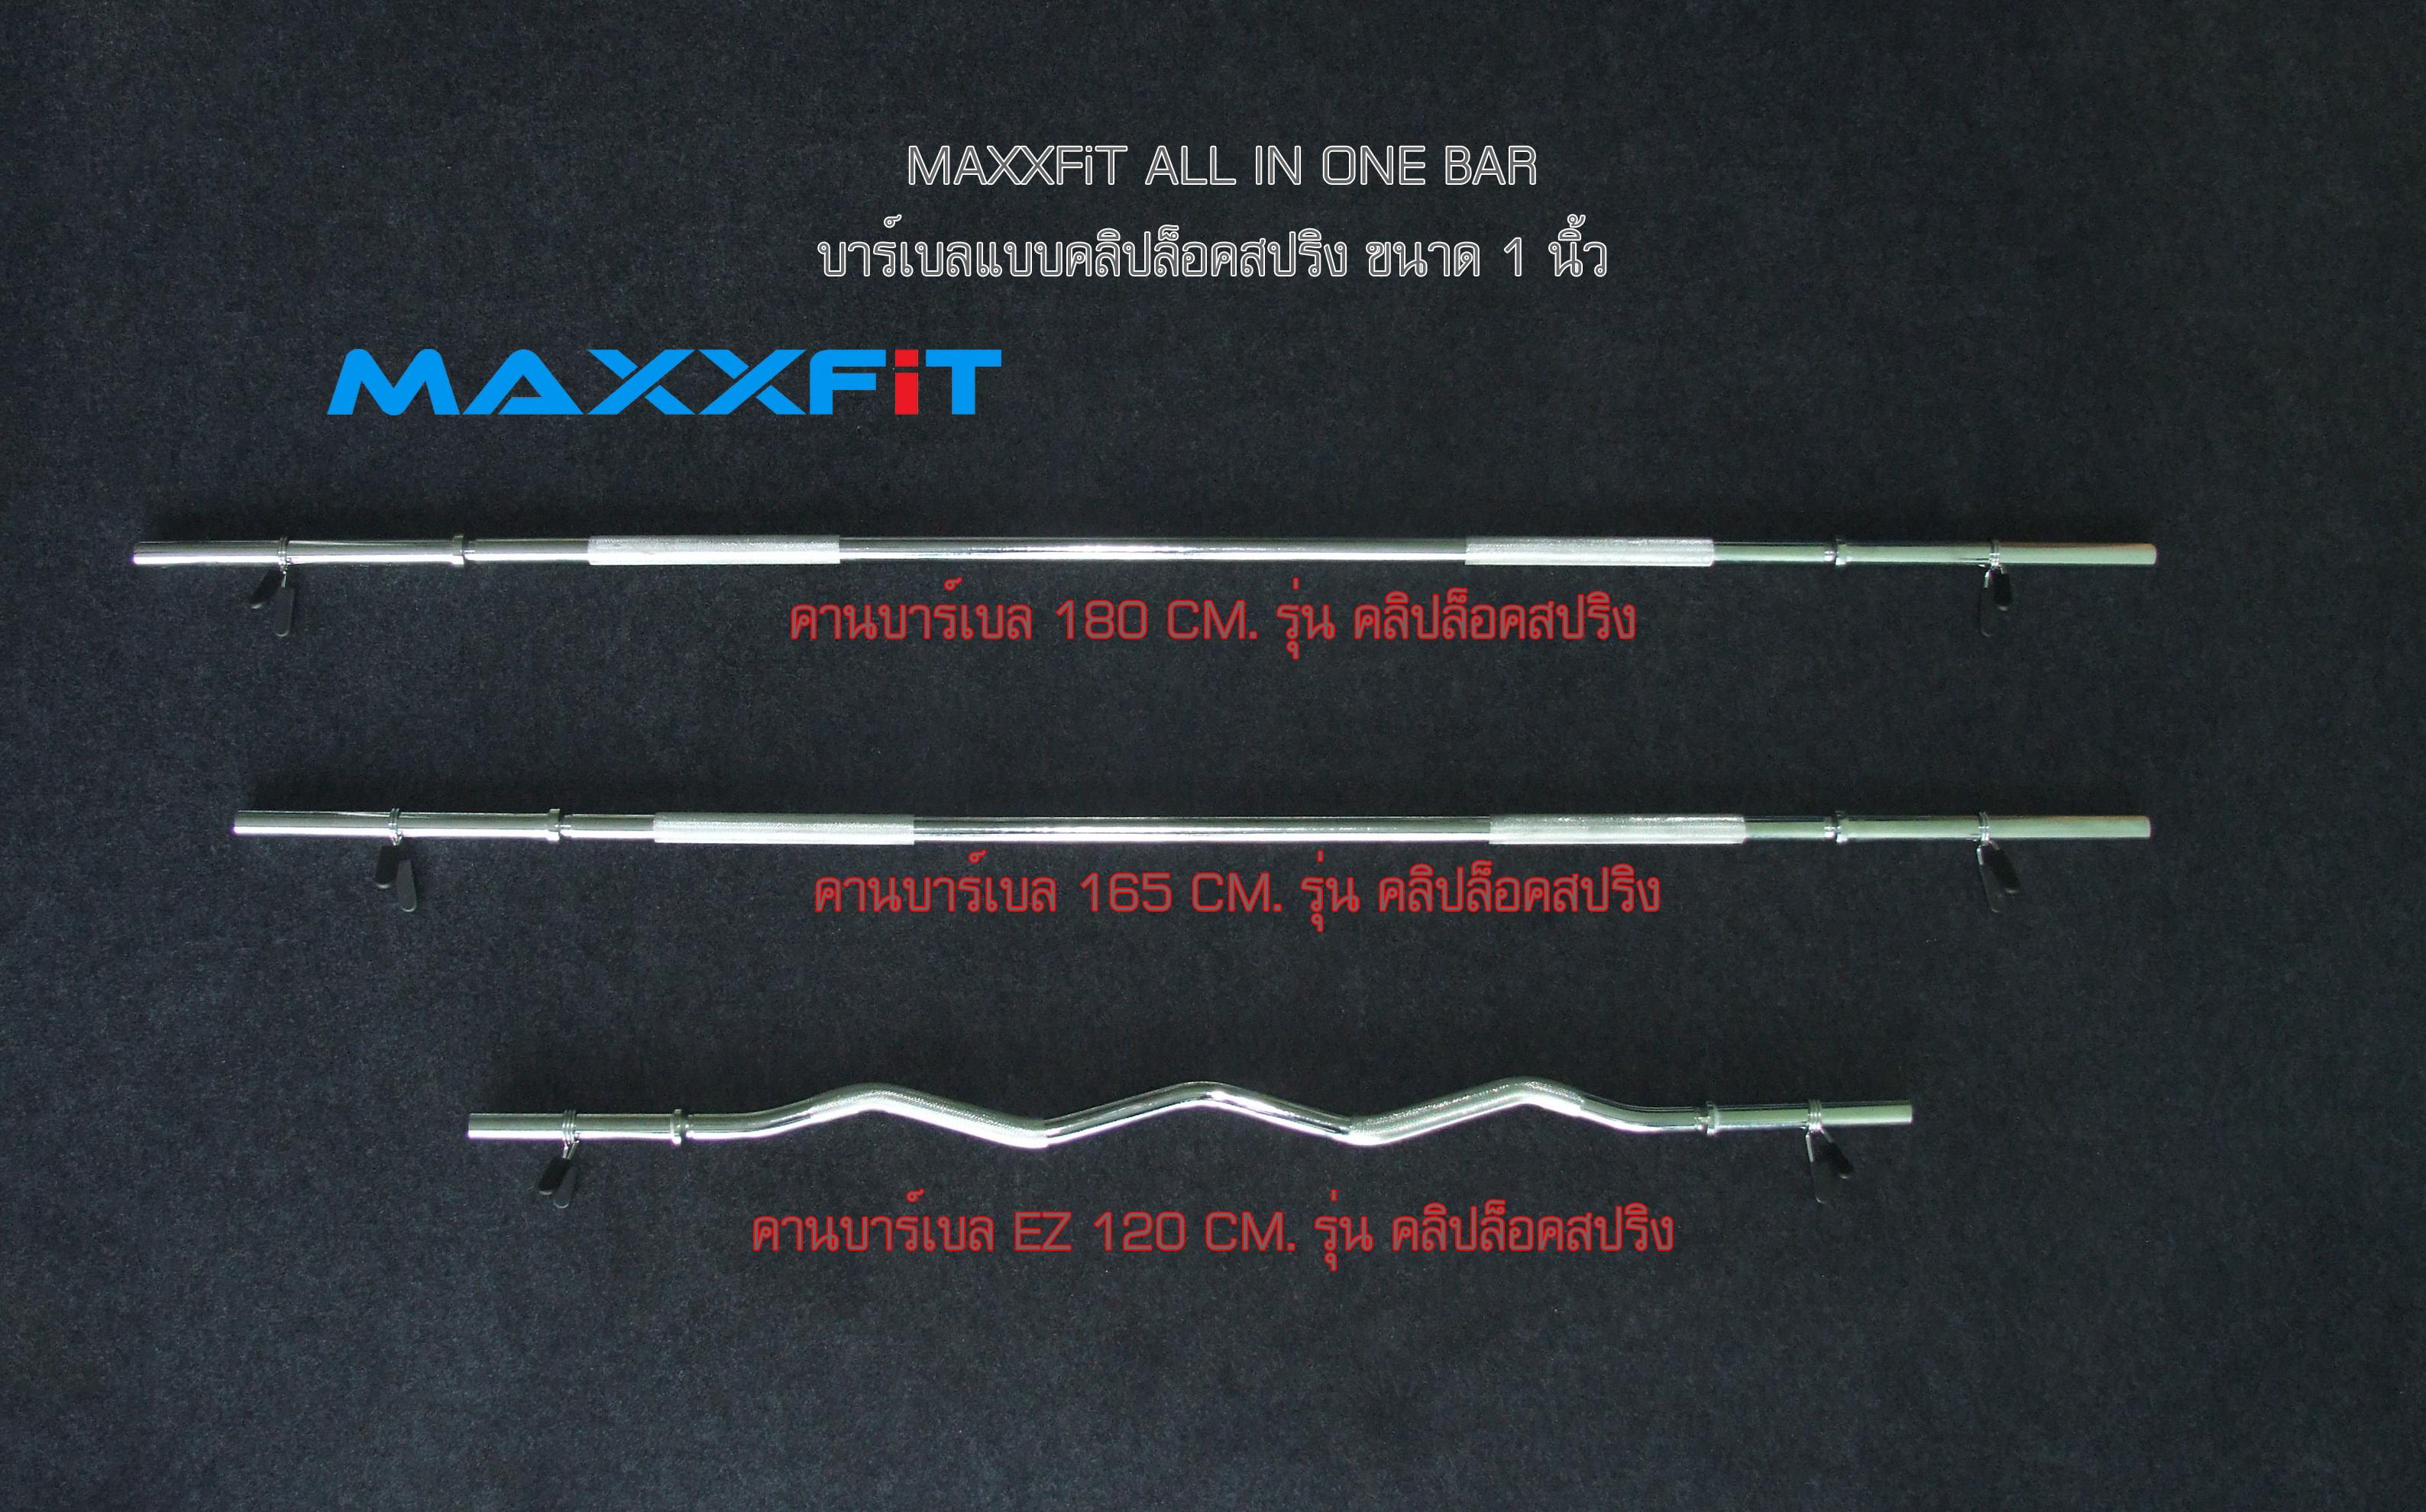 MAXXFiT ALL IN ONE BAR บาร์เบลแบบคลิปล็อคสปริง ขนาด 1 นิ้ว